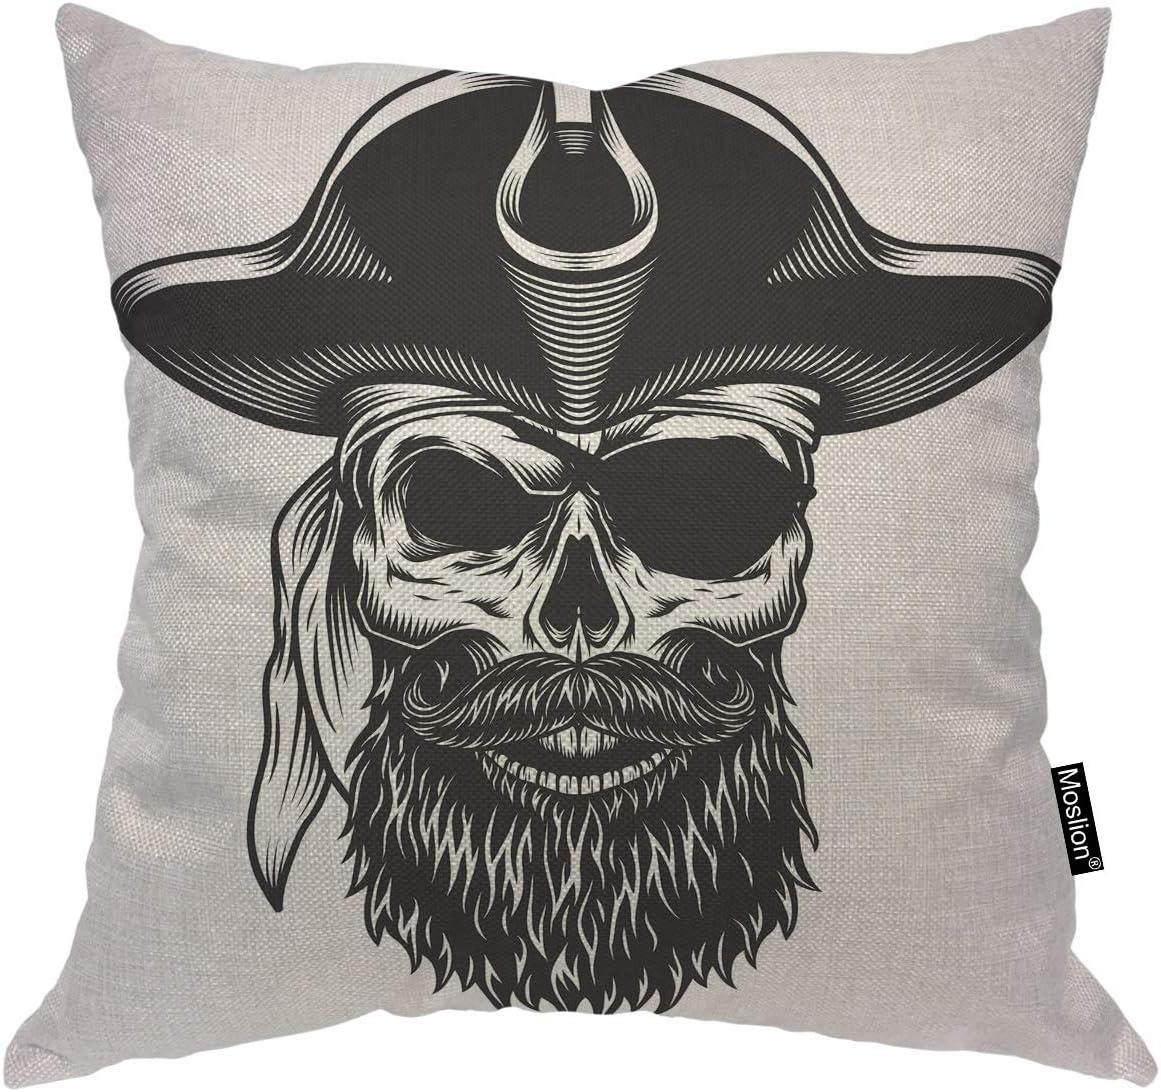 Moslion Skull Superior Decorative Pillow Covers OFFer 16x16 Inch Vin Monochrome